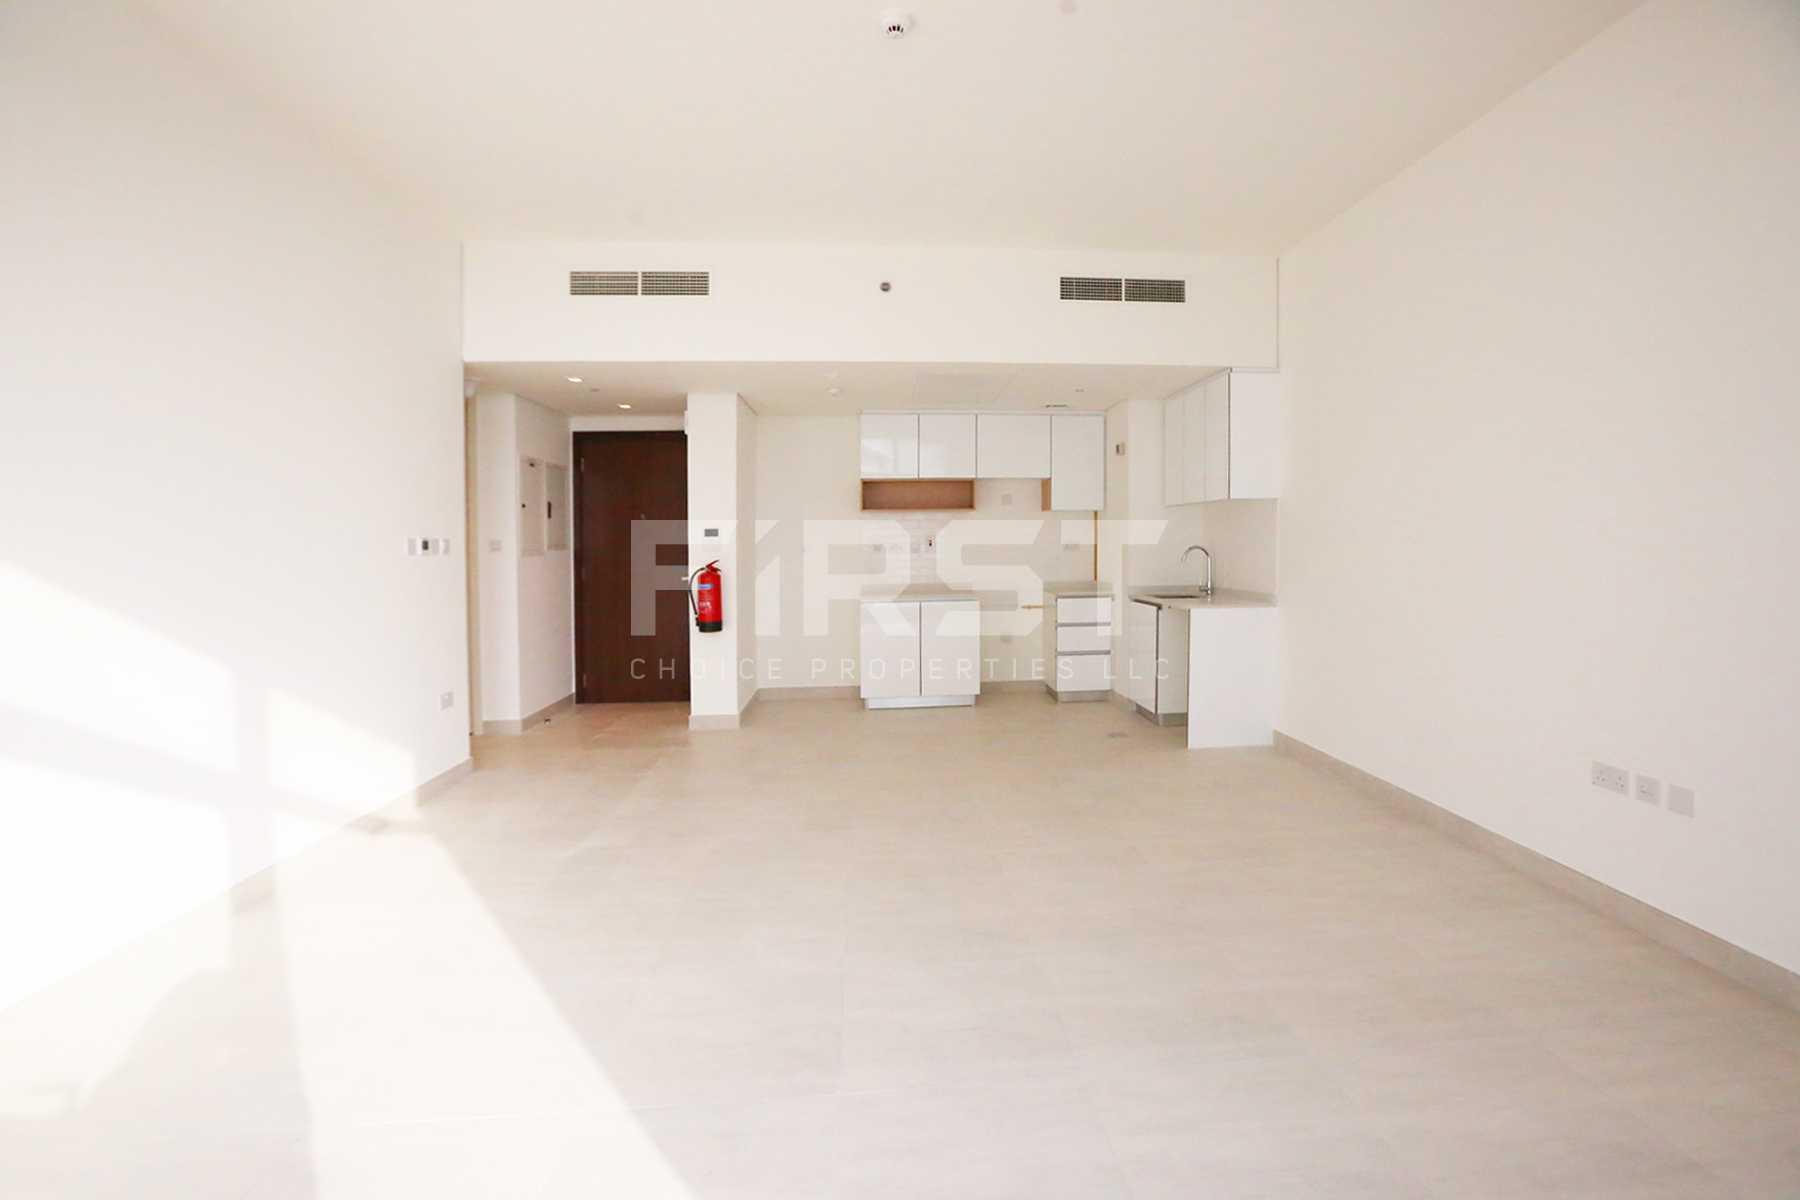 Internal Photo of 1 Bedroom Apartment in The Bridges Shams Abu Dhabi UAE (7).jpg